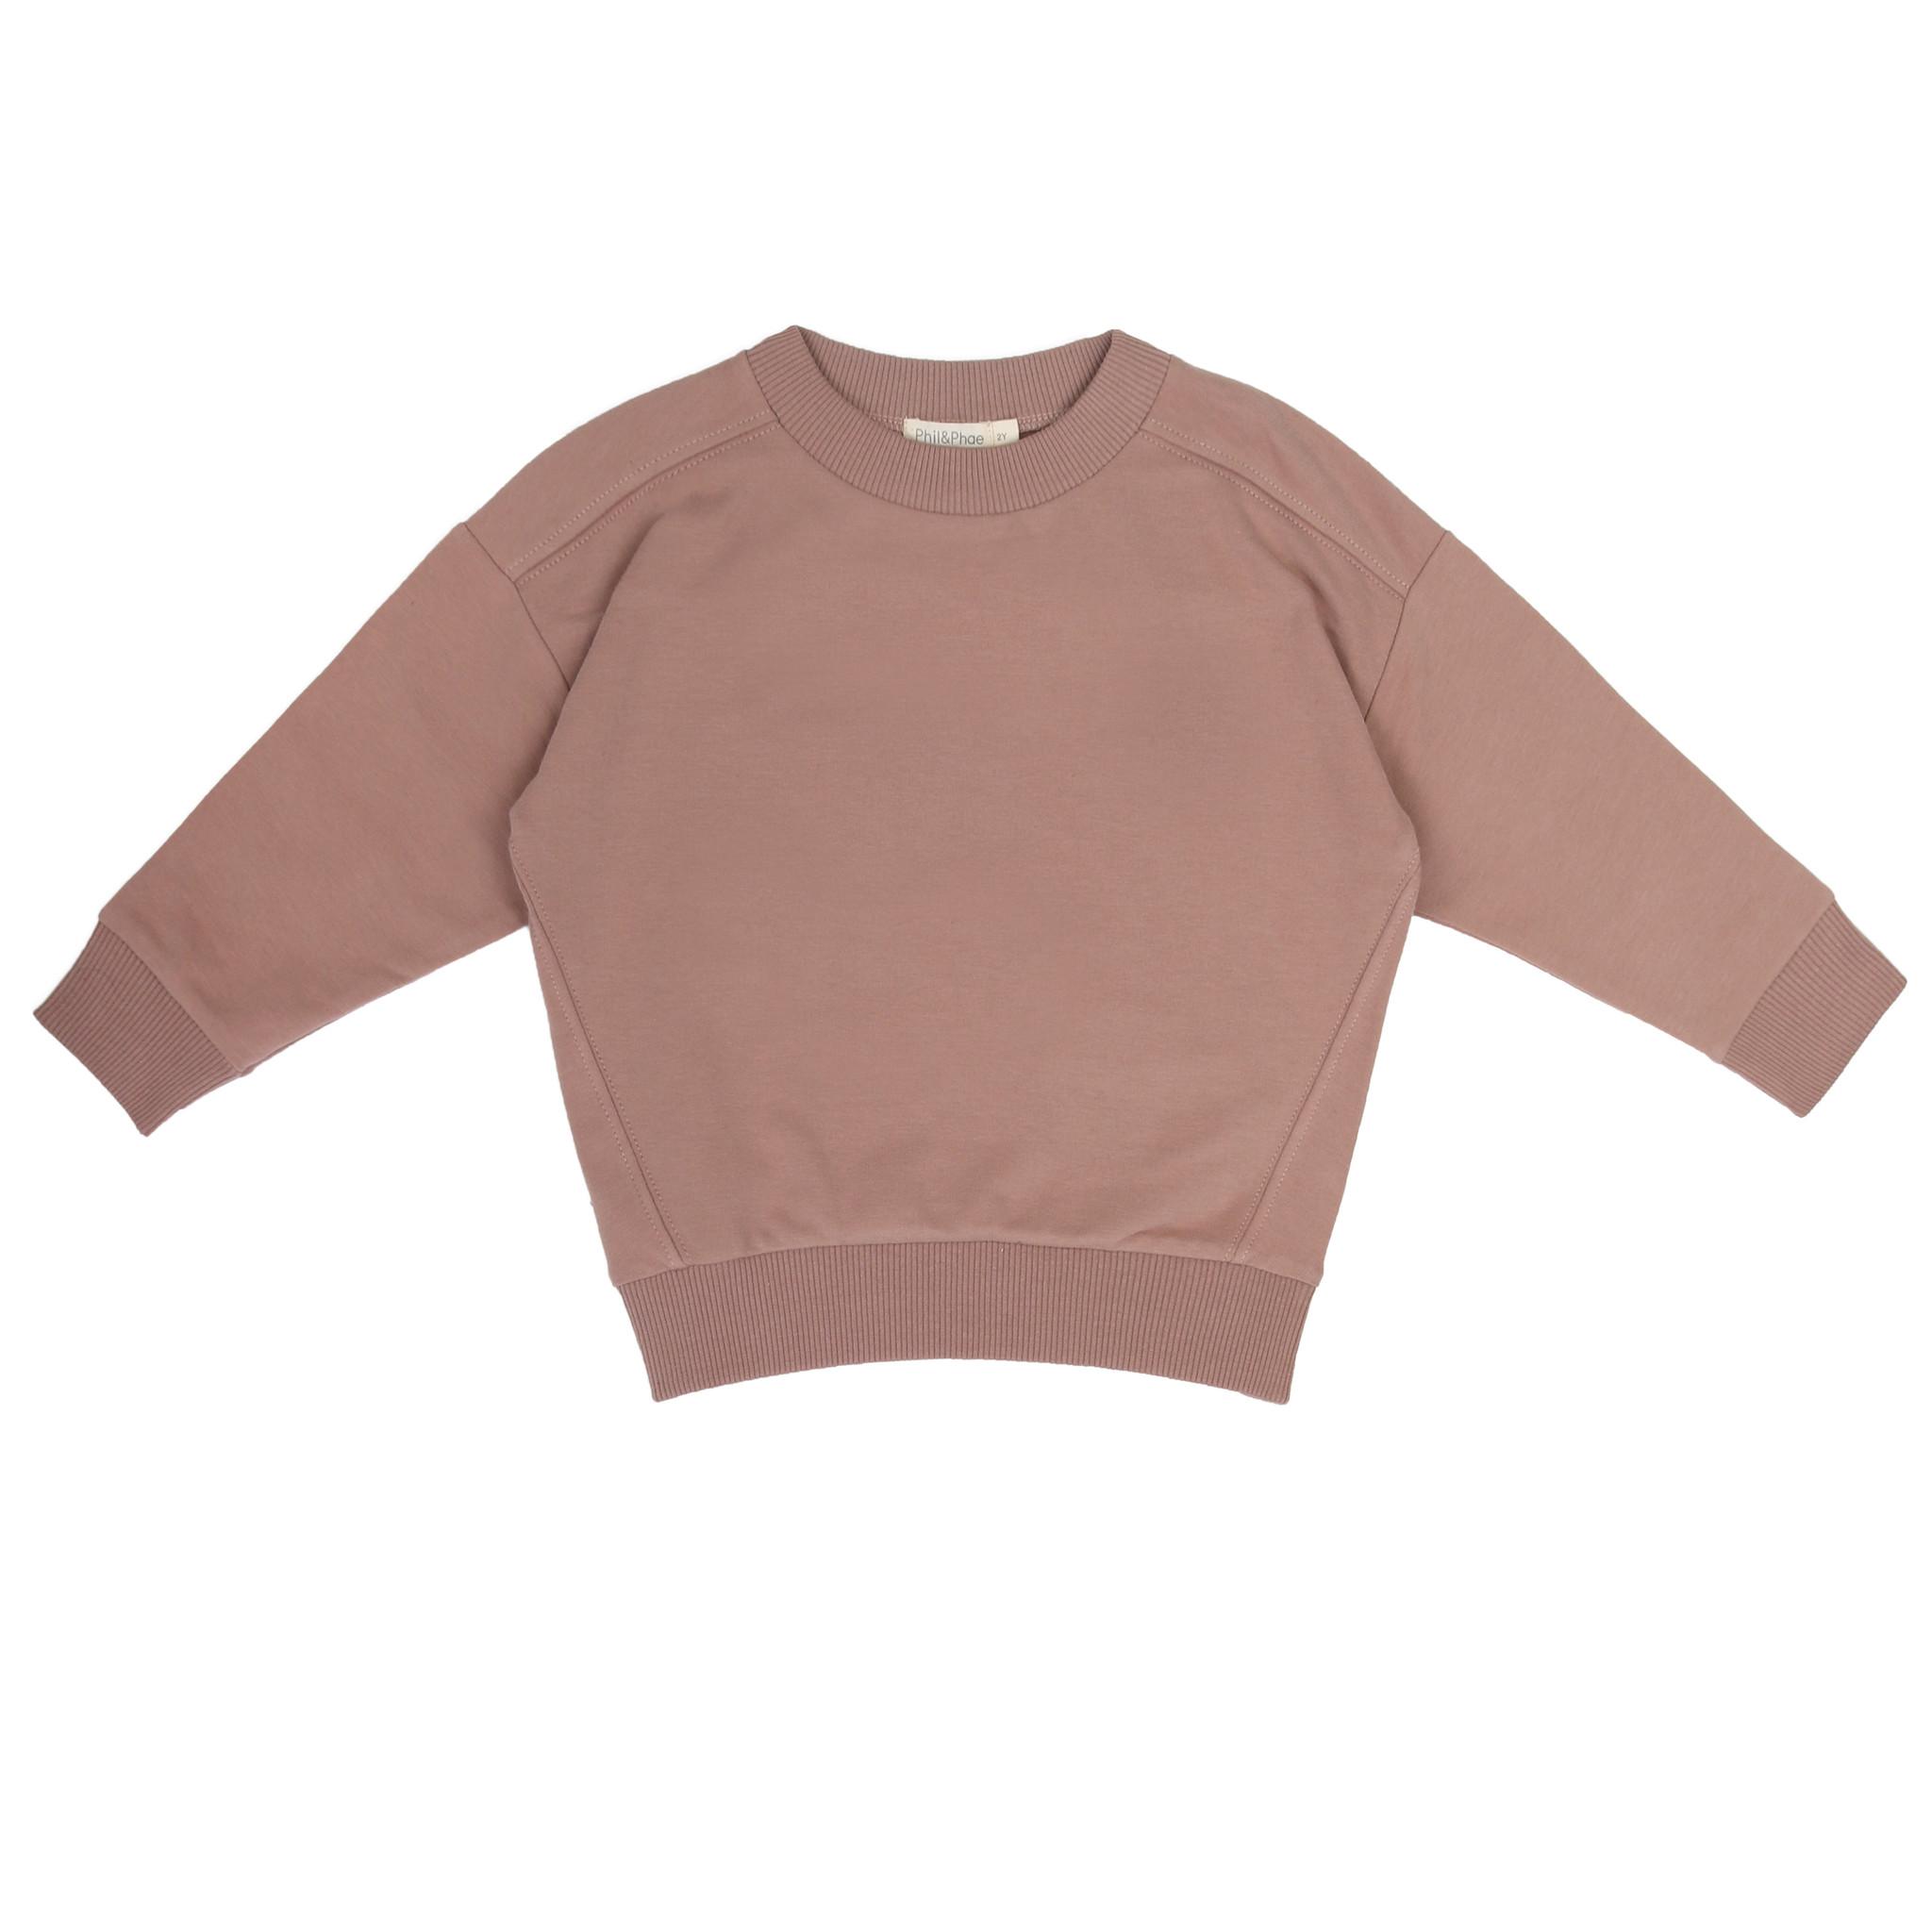 Oversized sweater - Powder-1